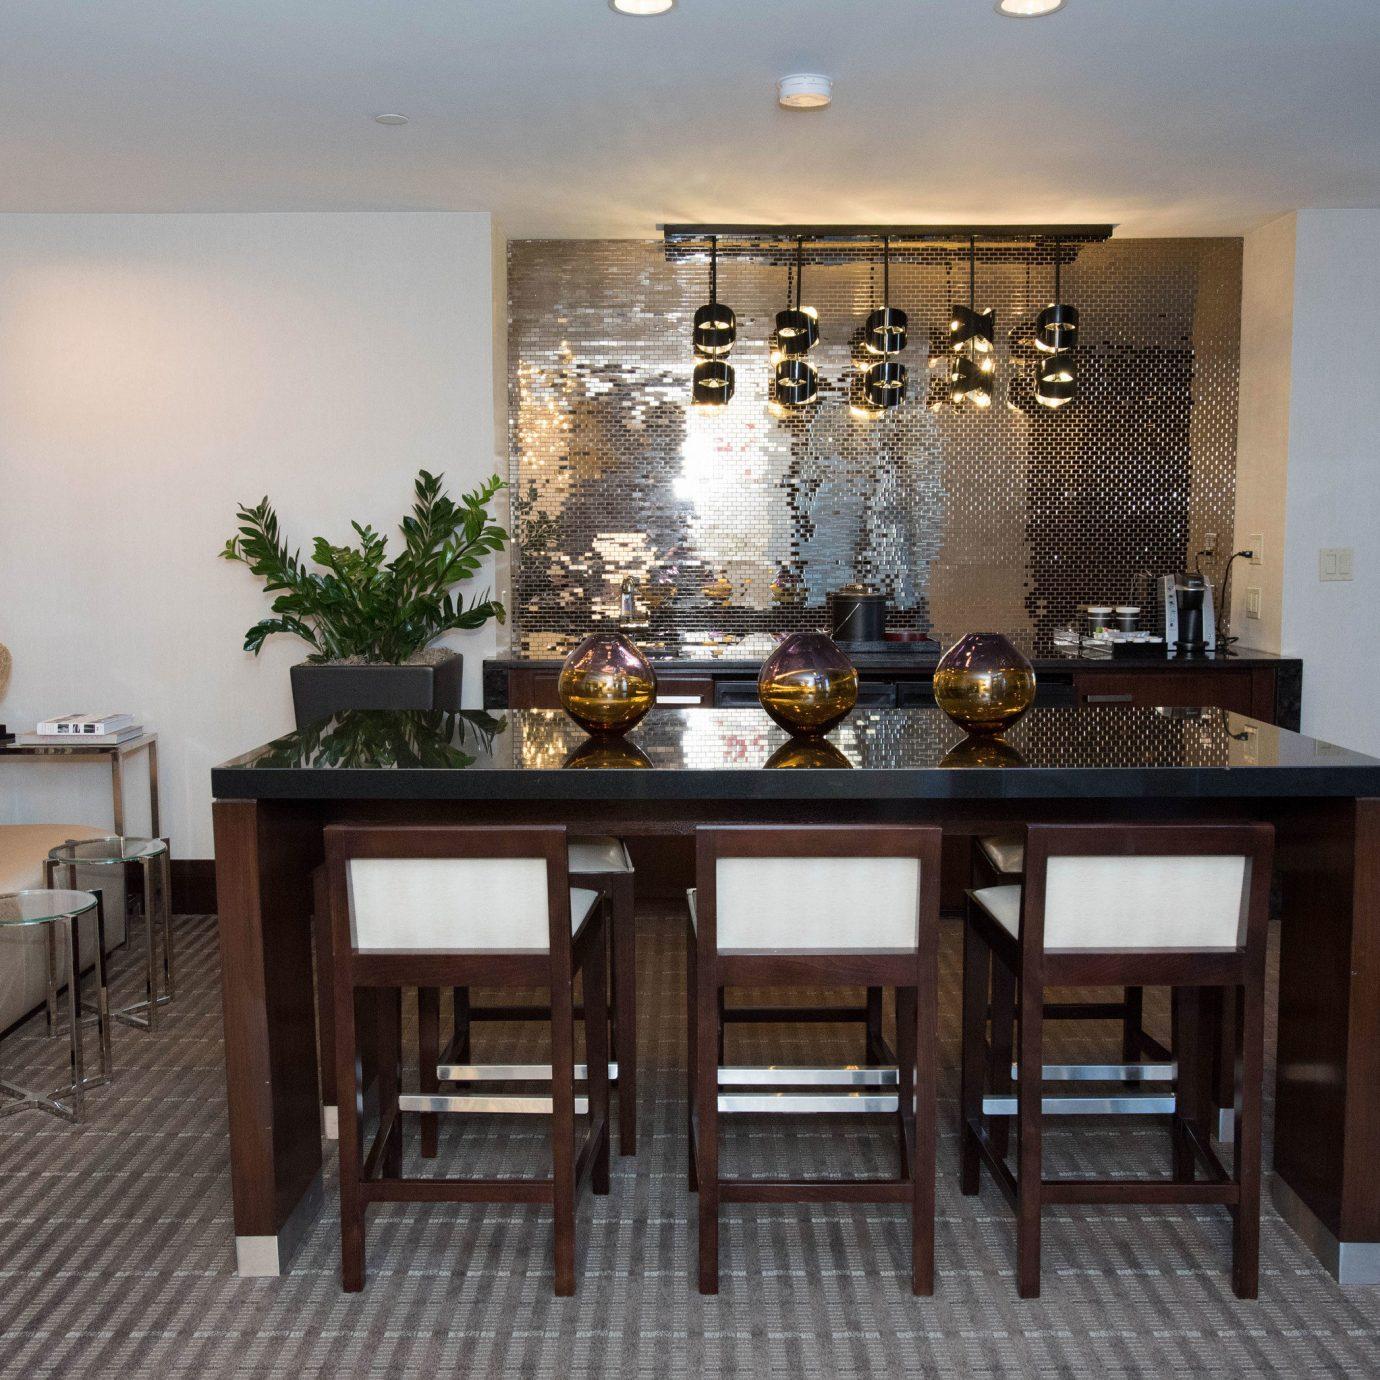 chair property hardwood home Kitchen living room cuisine Villa cabinetry condominium restaurant